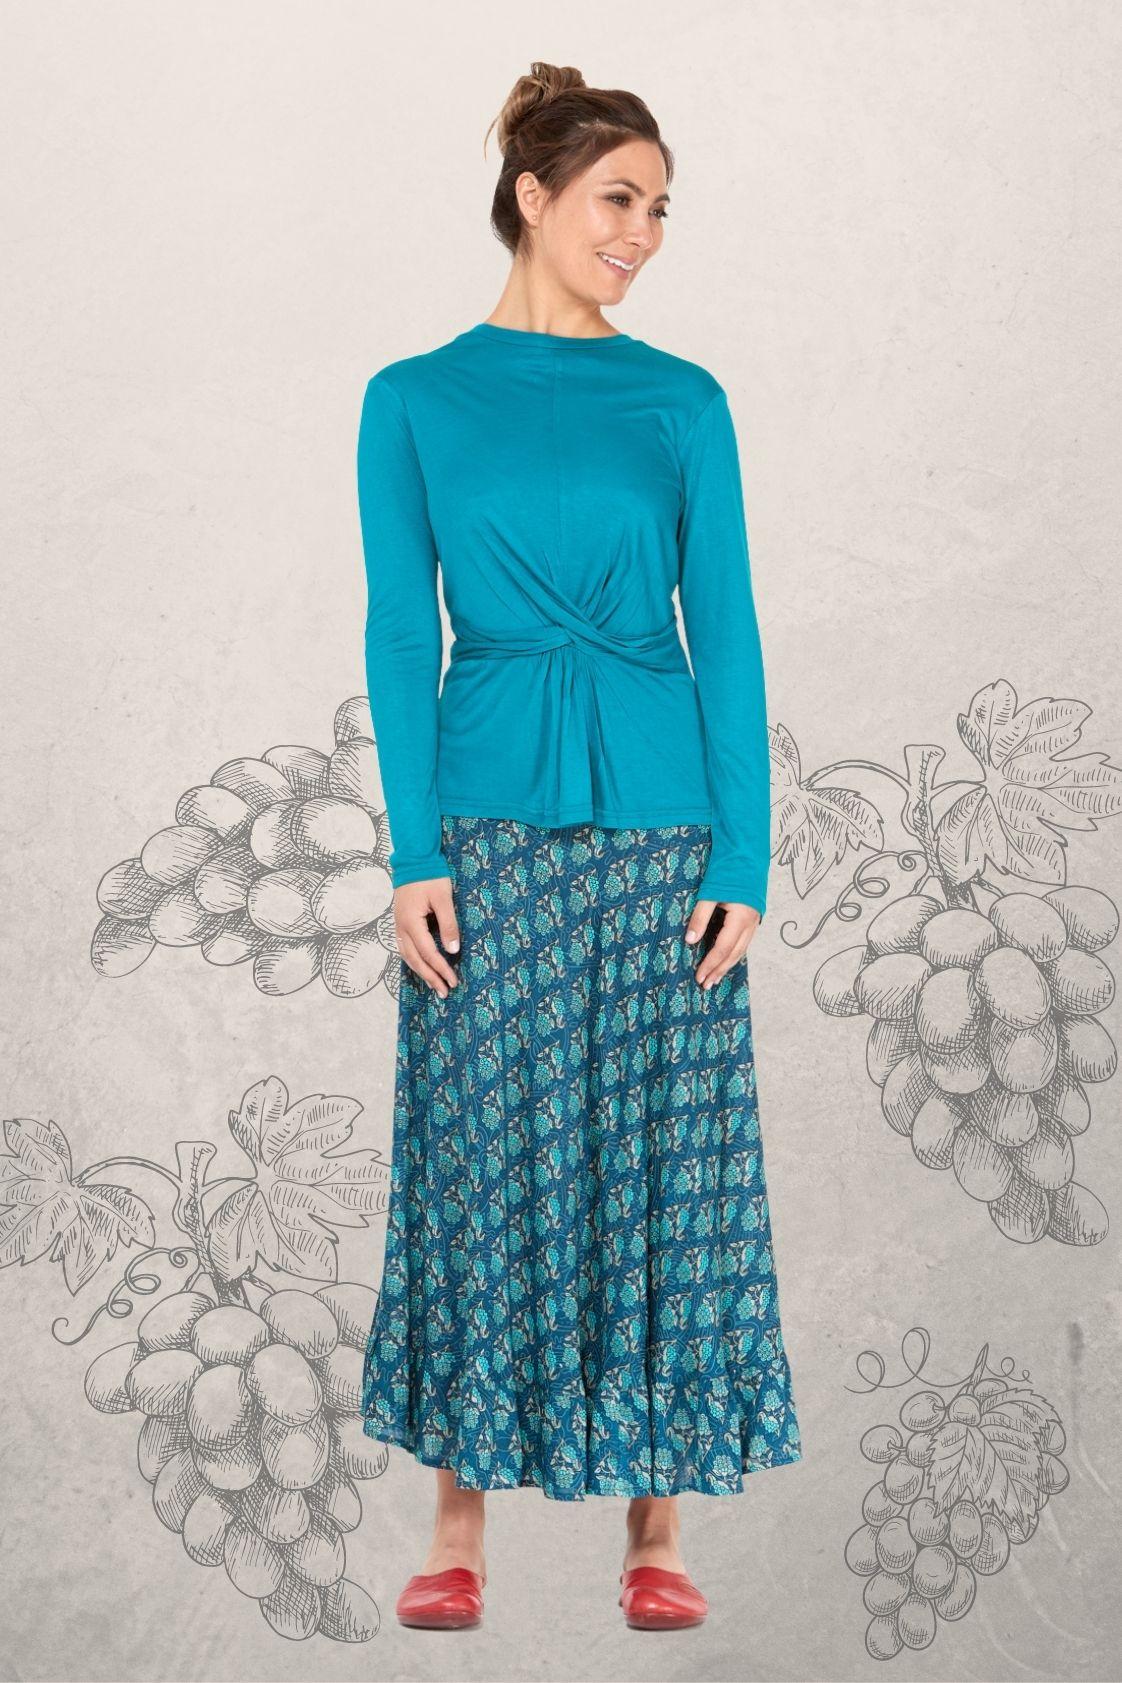 Gigi Frill Skirt - Grapes Print